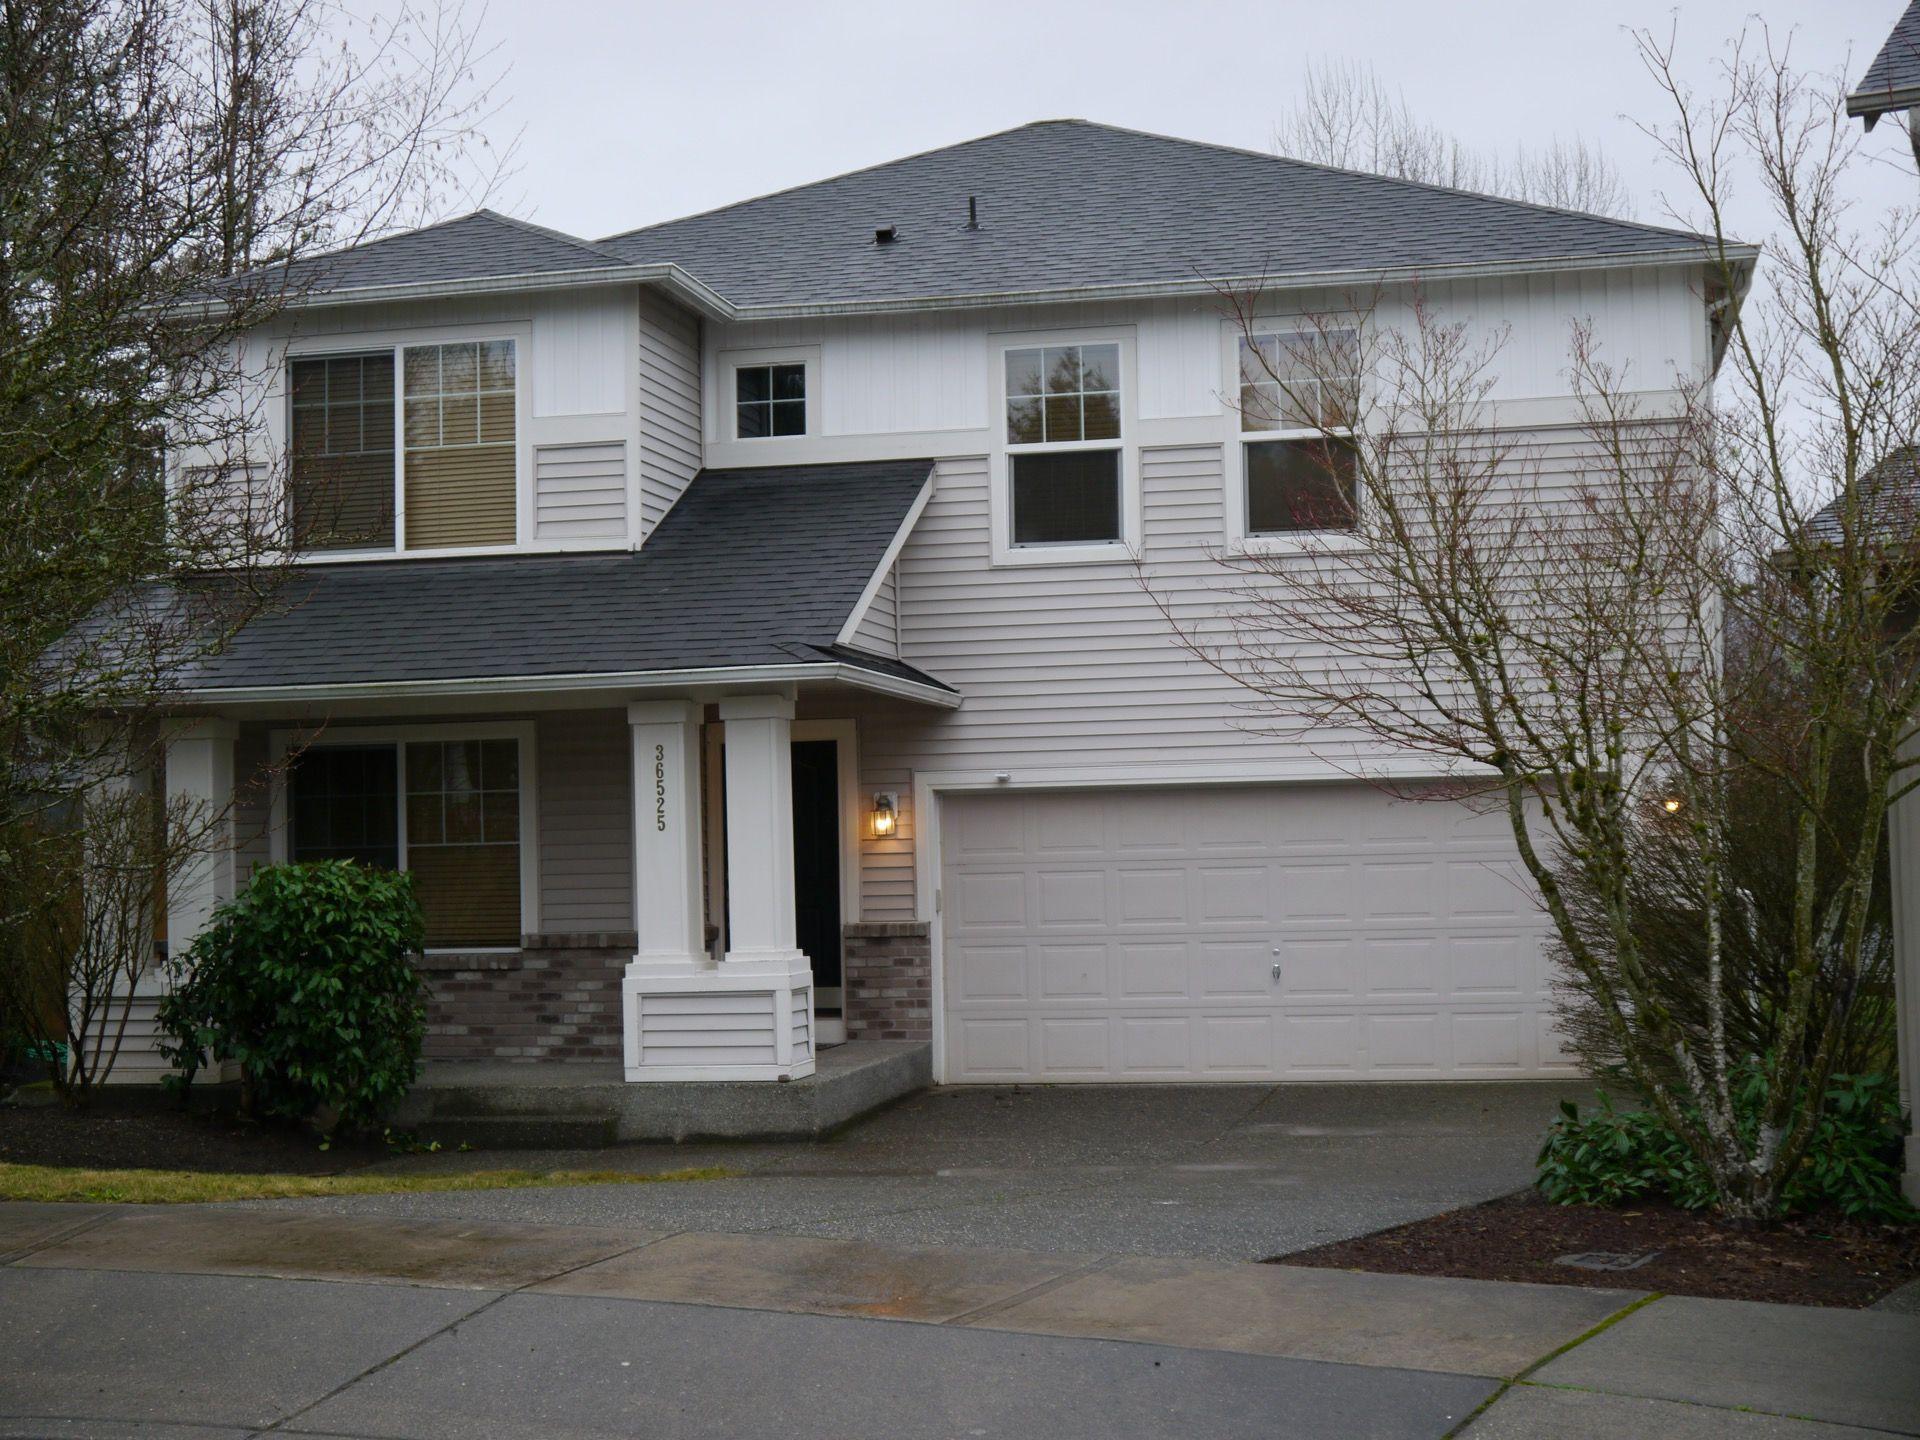 Fantastic 4 Bedroom Rental in Snoqualmie Ridge New homes